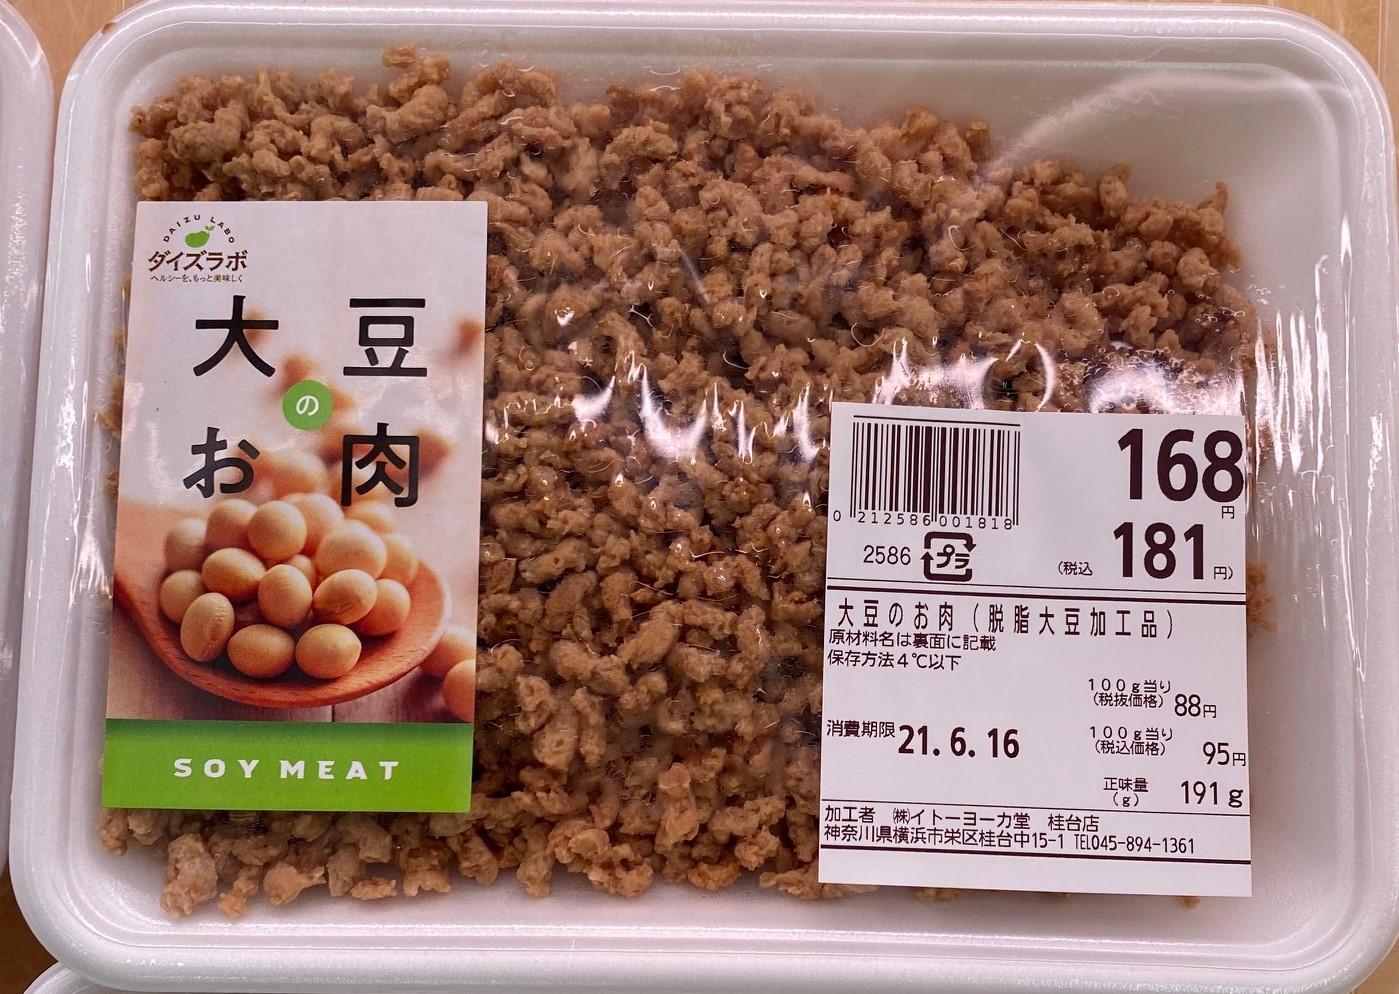 Daizu Labo (Soybean Laboratories) Soymeat June 2021